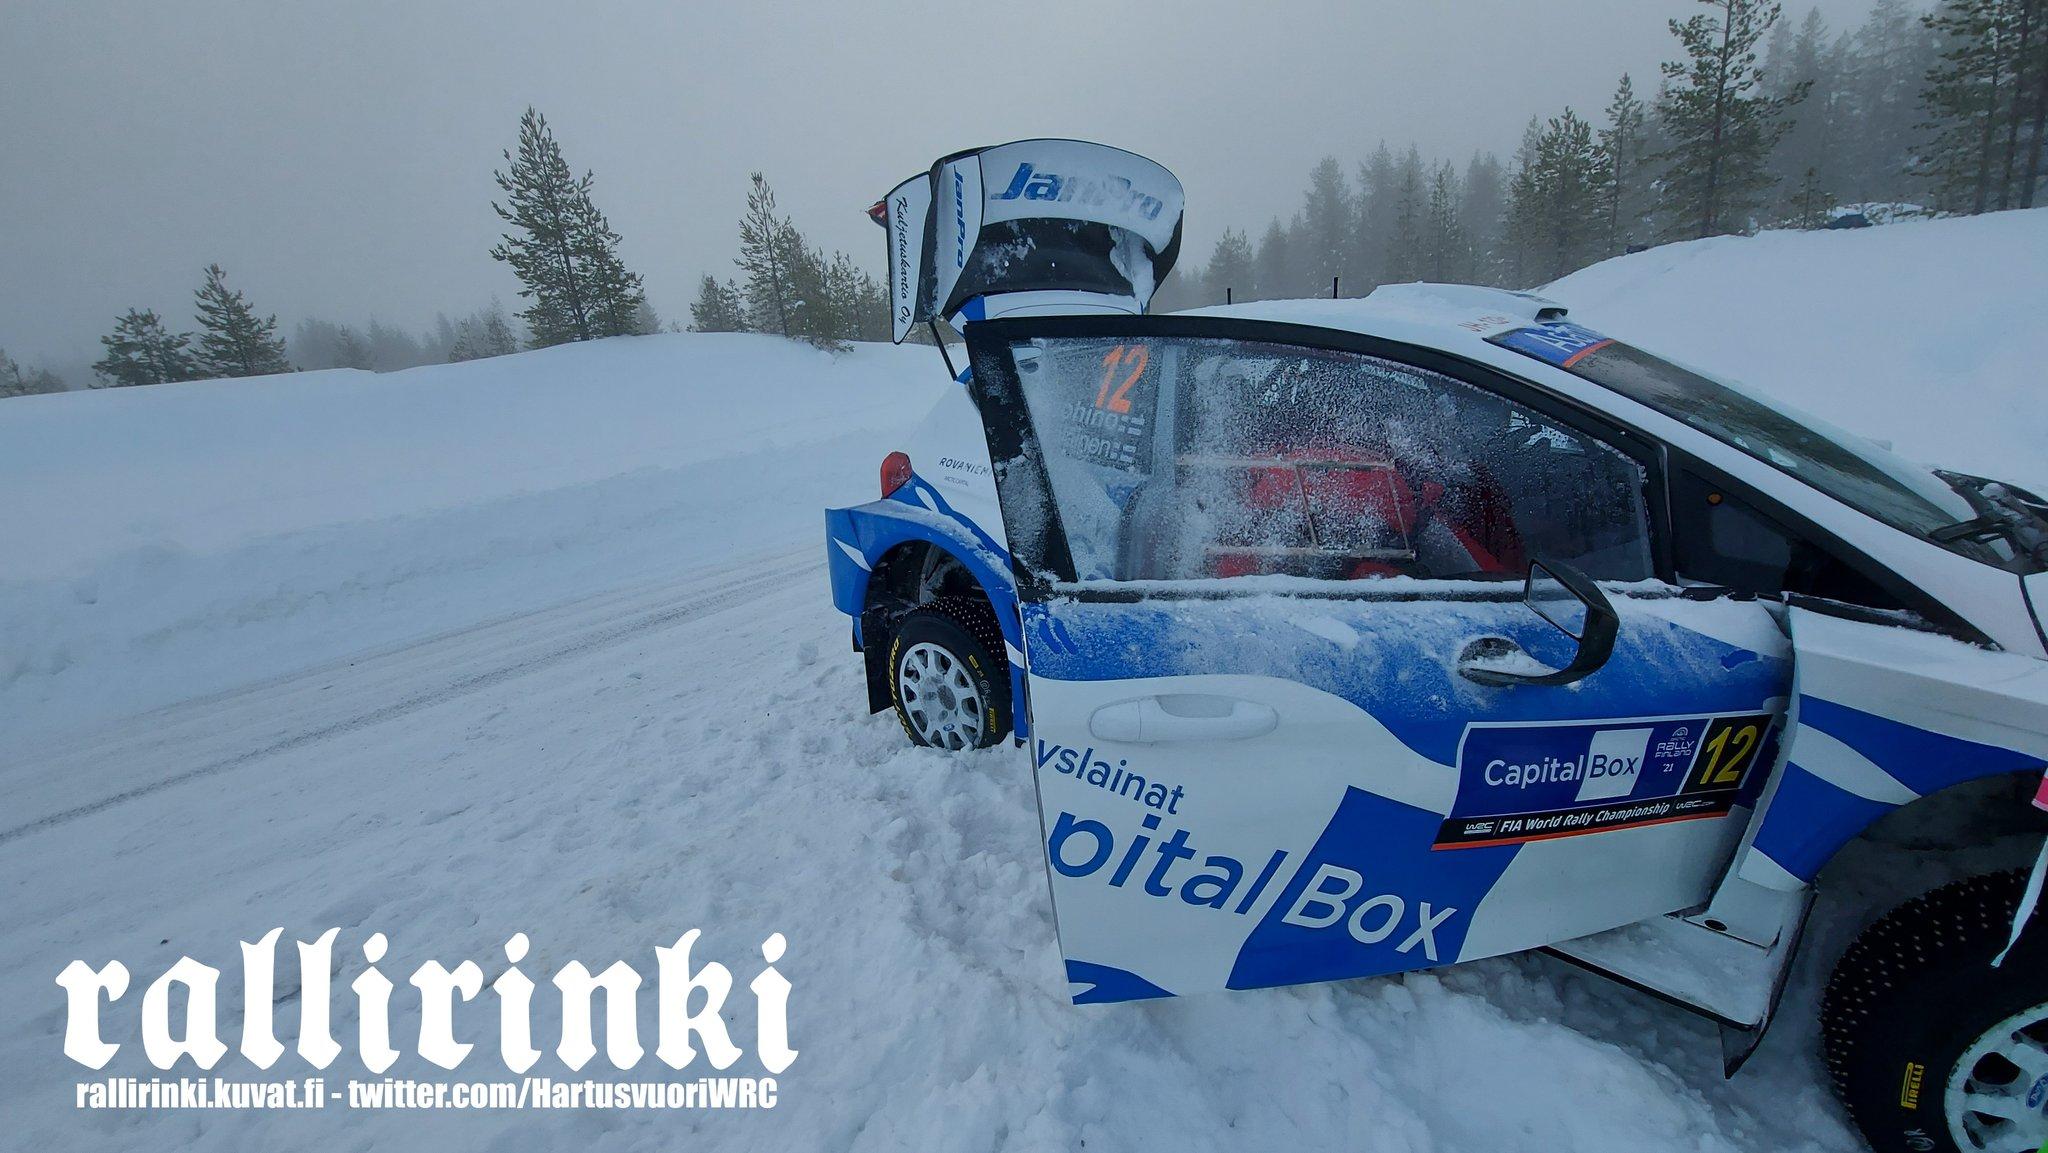 WRC: Arctic Rally Finland - Powered by CapitalBox [26-28 Febrero] - Página 2 EvImZ9hXMAAV-ht?format=jpg&name=large